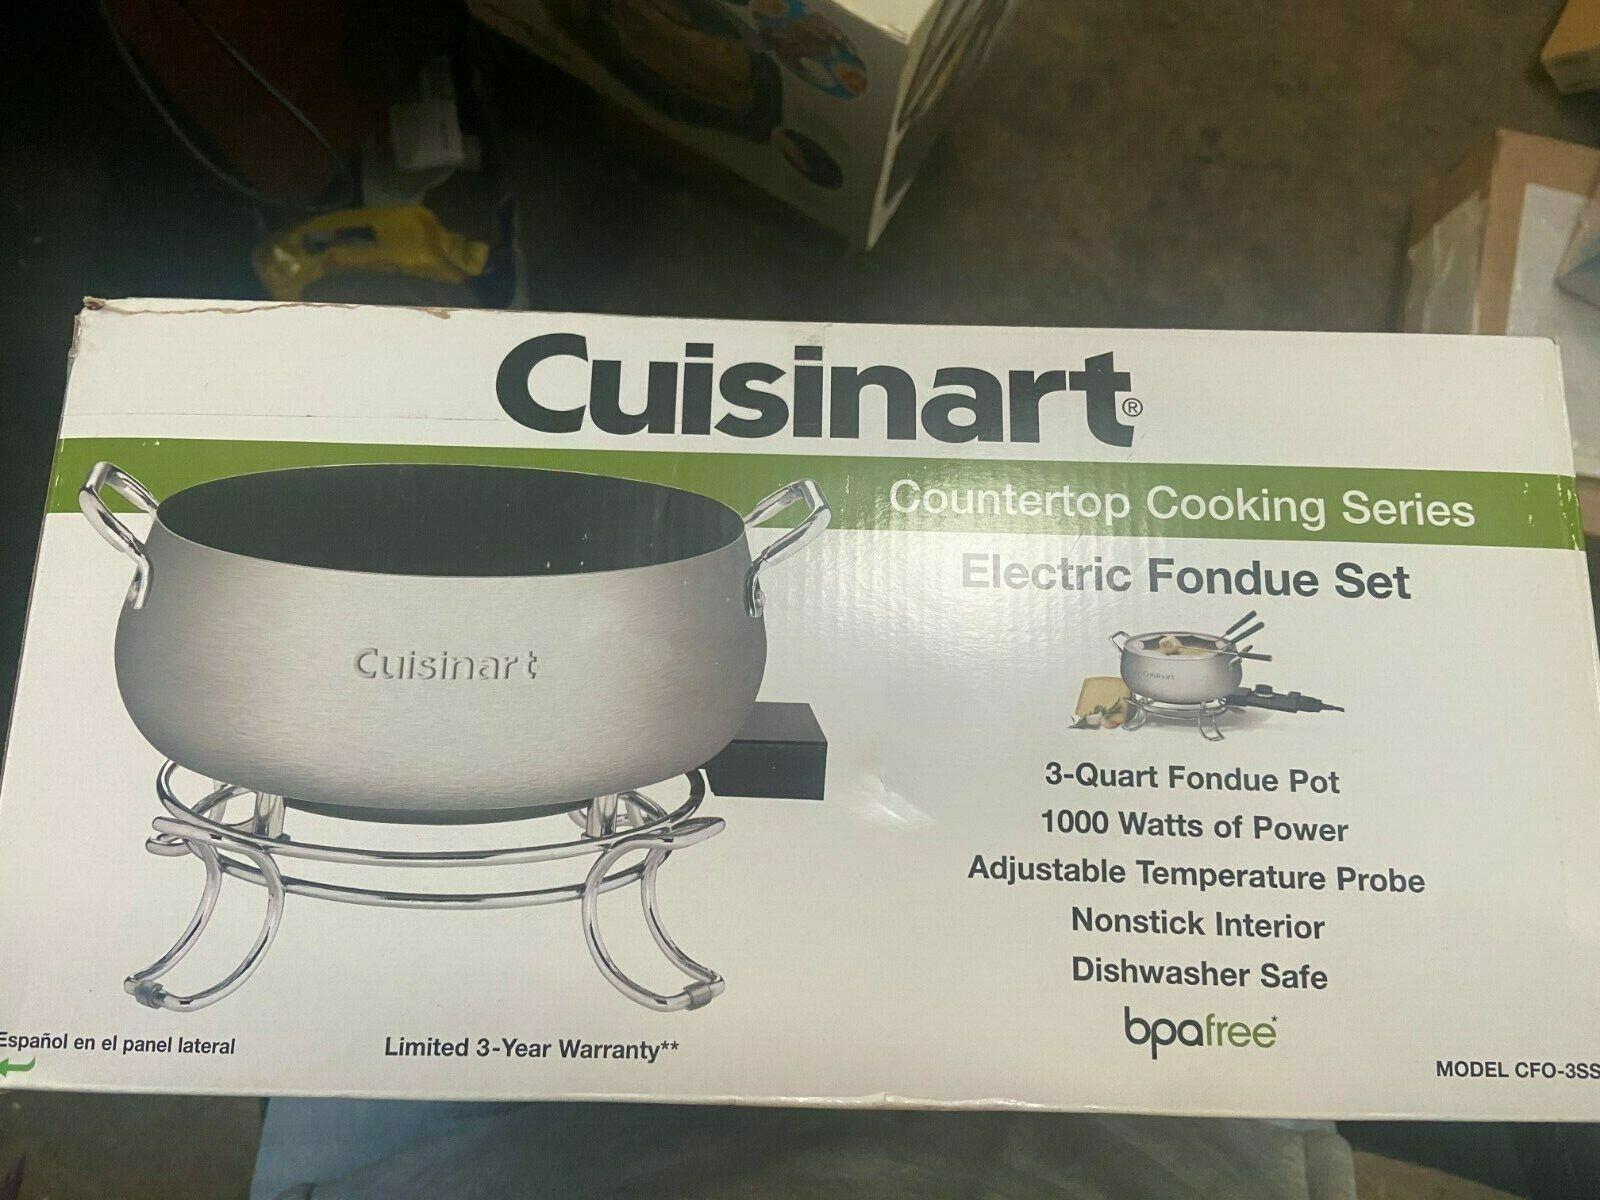 Cuisinart CFO-3SS Electric Fondue Set - $60.38